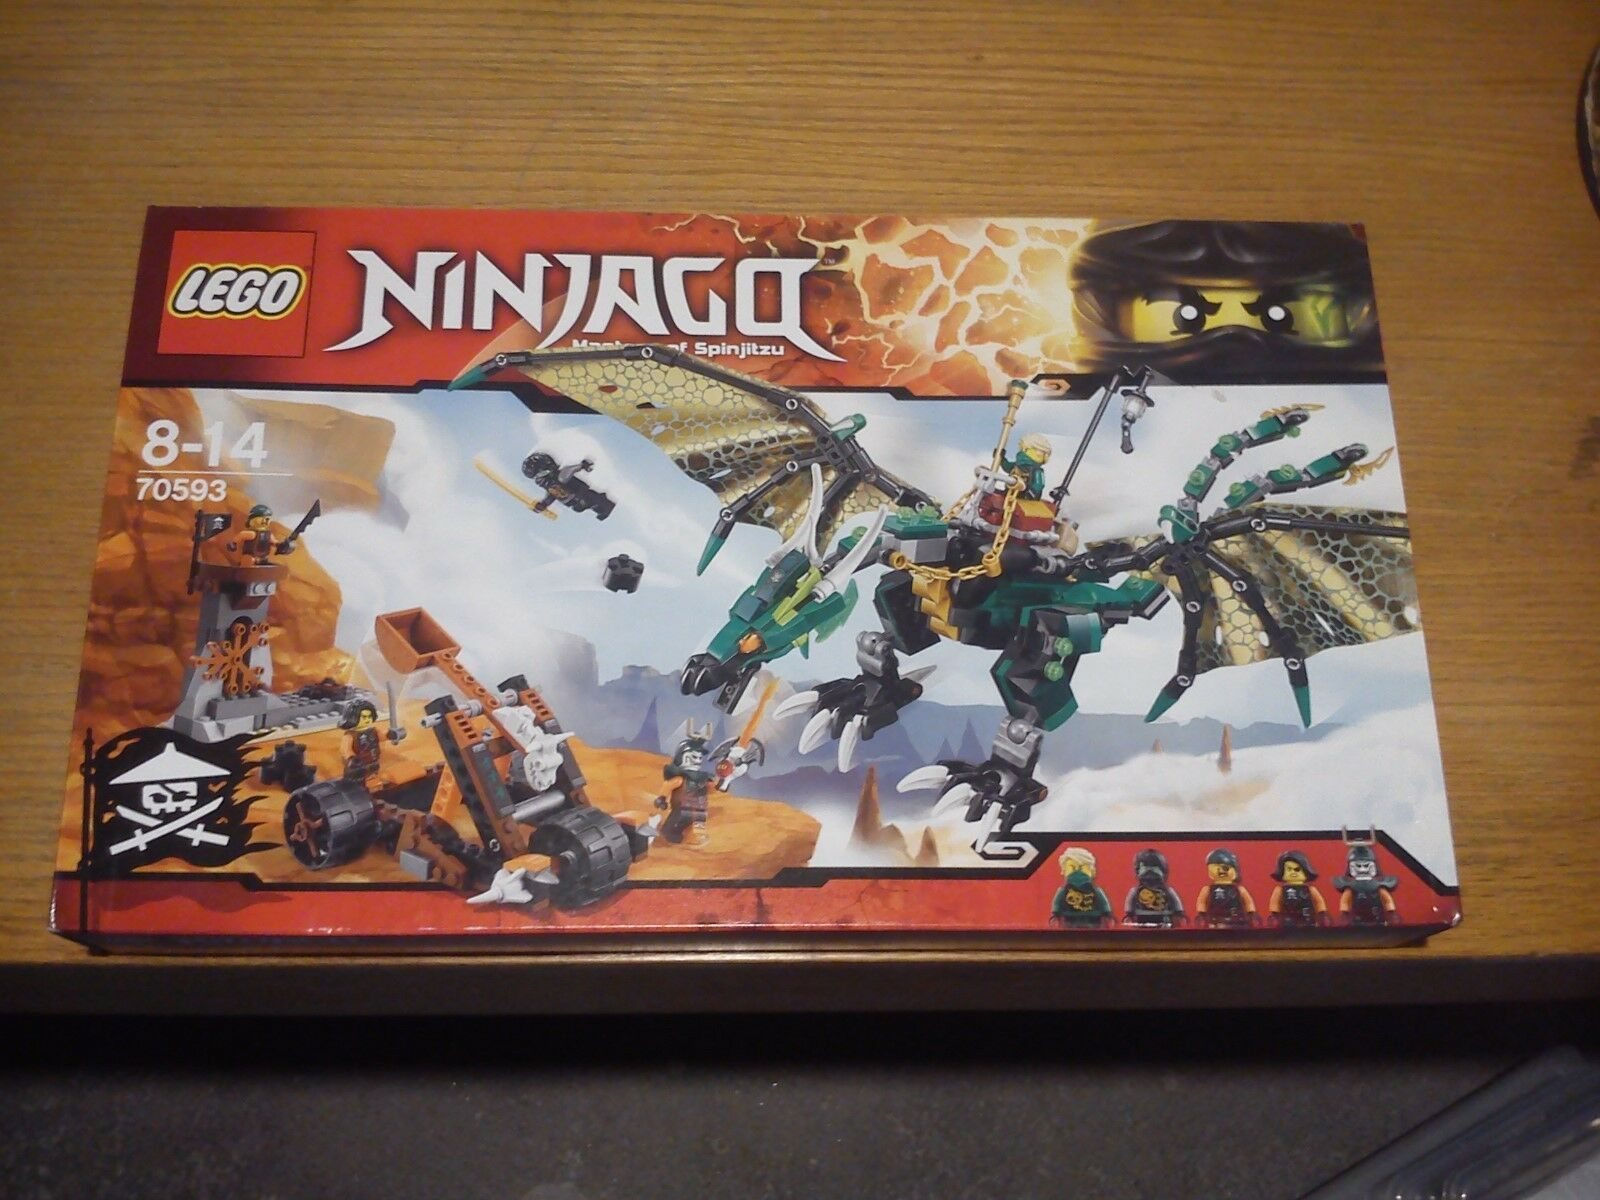 Lego 70593 Ninjago  Skybound  Le dragon émeraude de Lloyd  Nuovo & Sealed